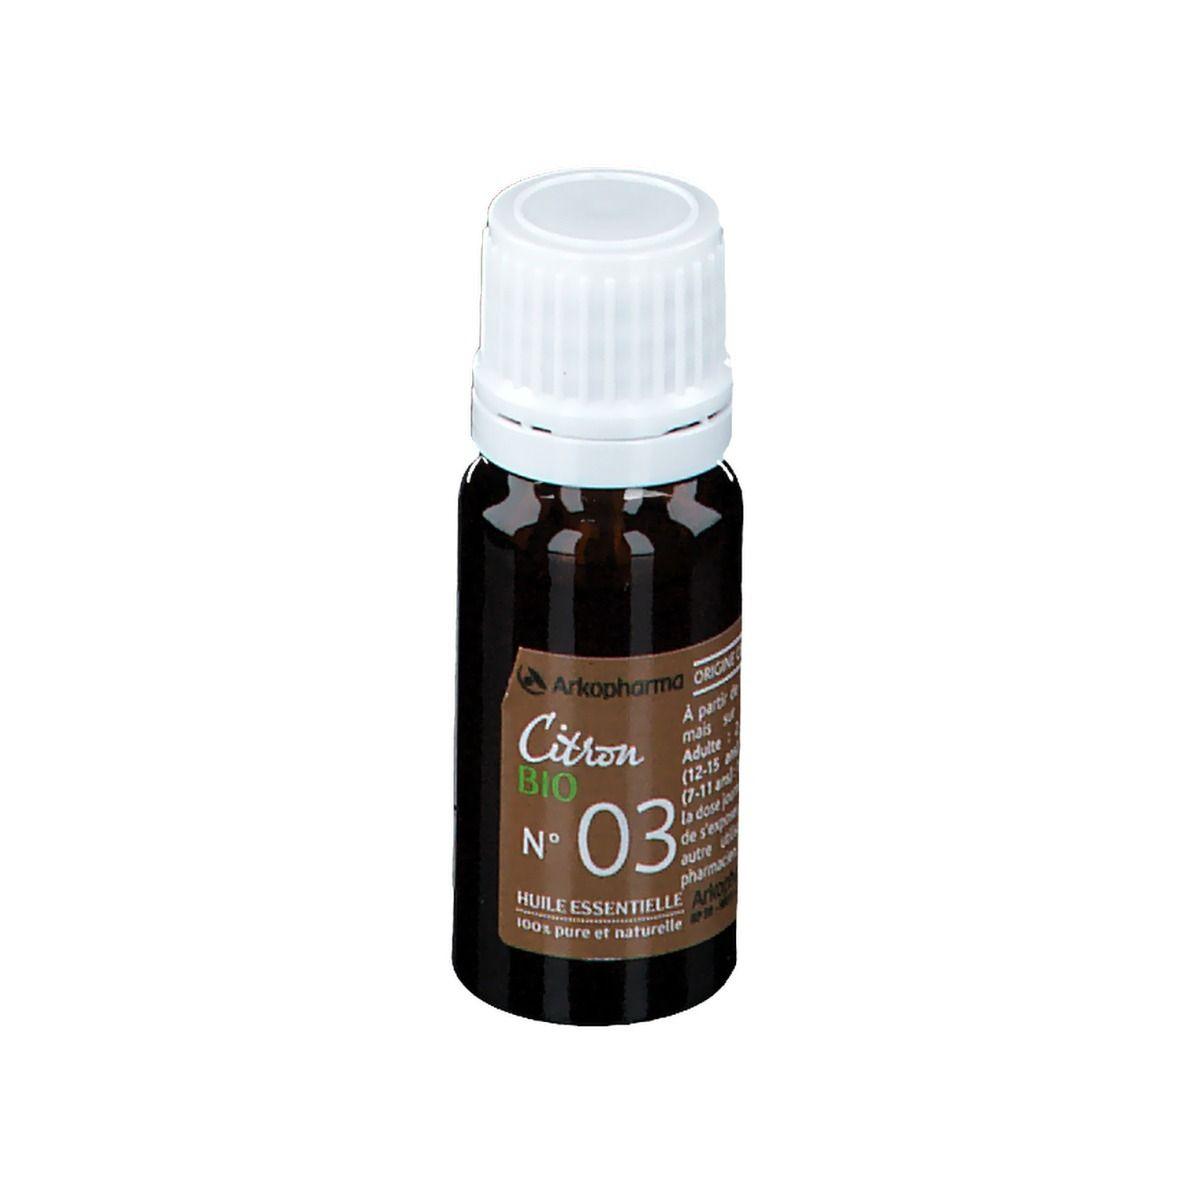 Arkopharma Huile essentielle de Citron BIO ml goutte(s)